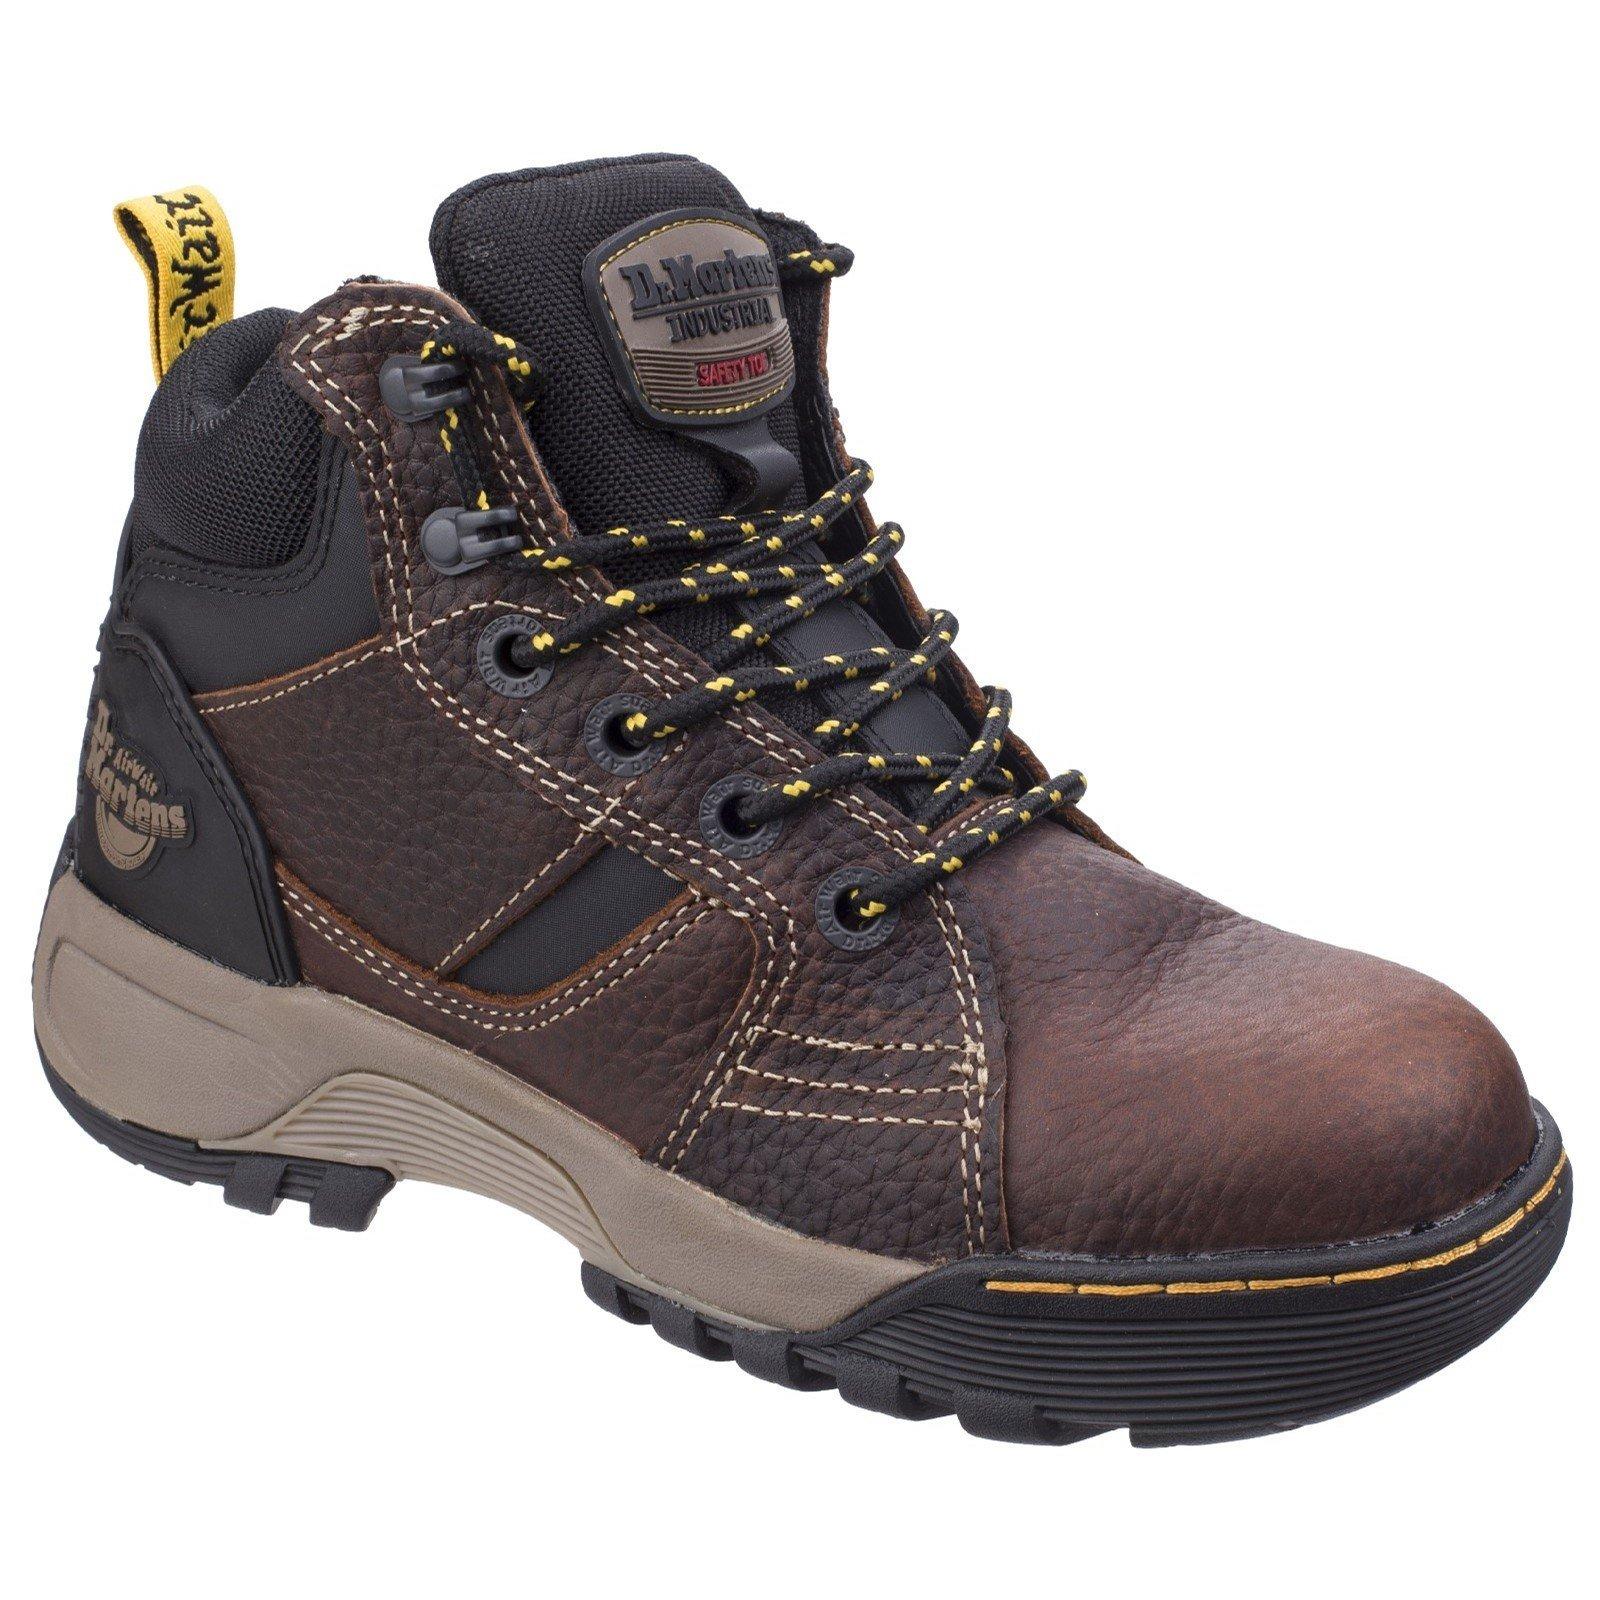 Dr Martens Men's Grapple Safety Boot Various Colours 26023 - Teak 3